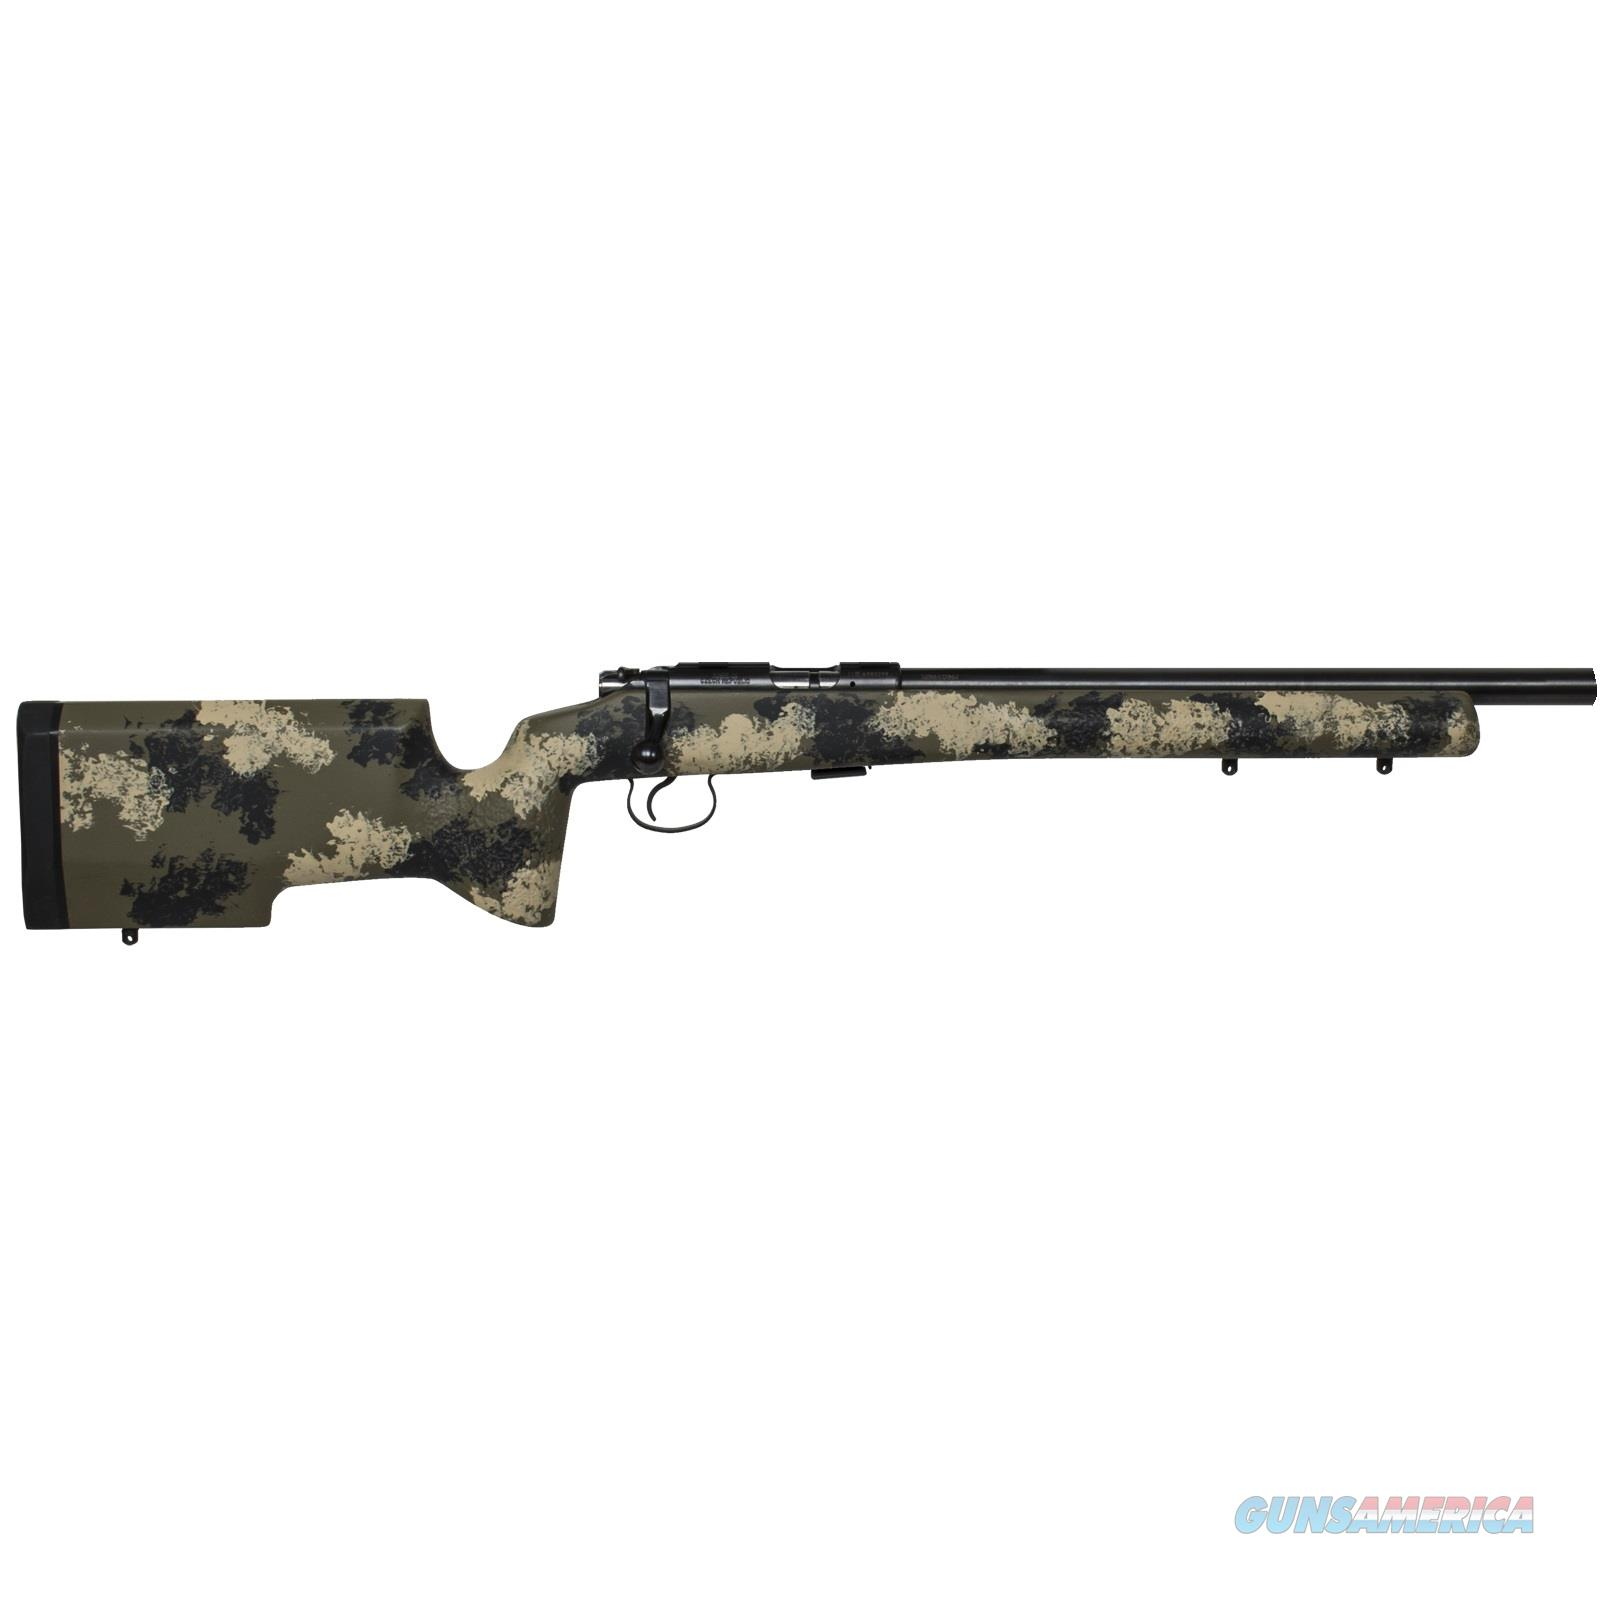 "CZ 455 Varmint Precision Trainer Camo 16.5"" Threaded Barrel .22 LR 02138  Guns > Rifles > CZ Rifles"